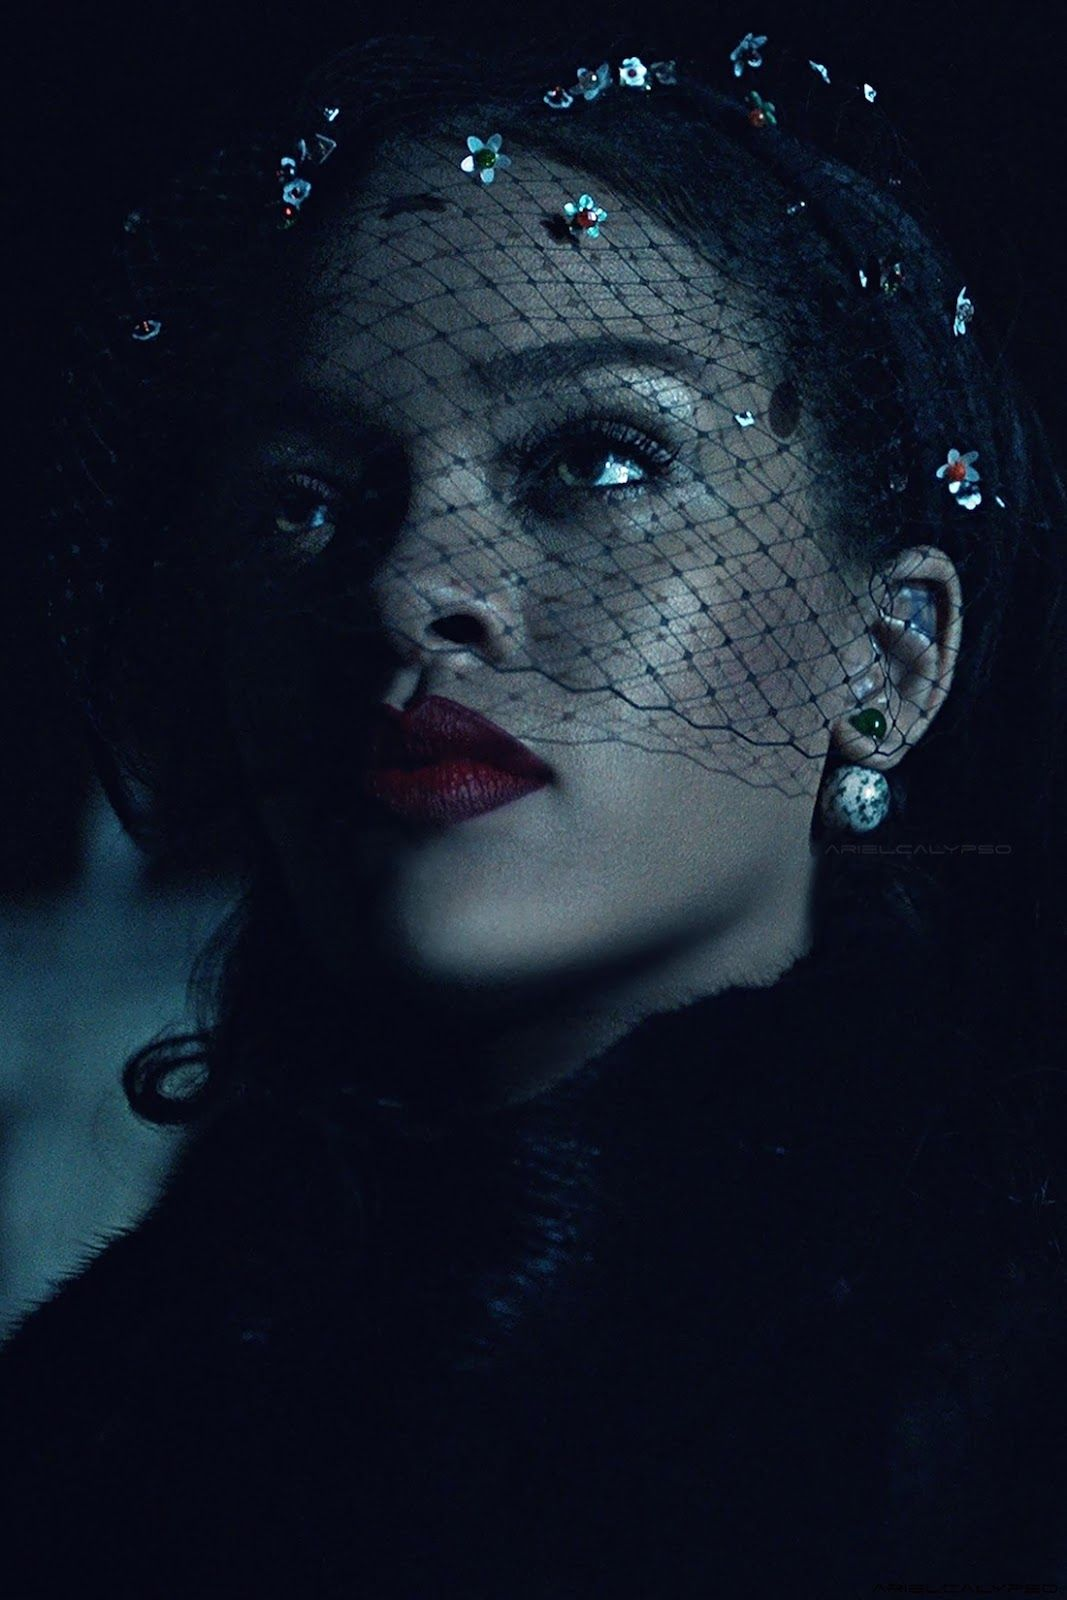 Dior Secret Garden 2015 Campaign featuring Rihanna